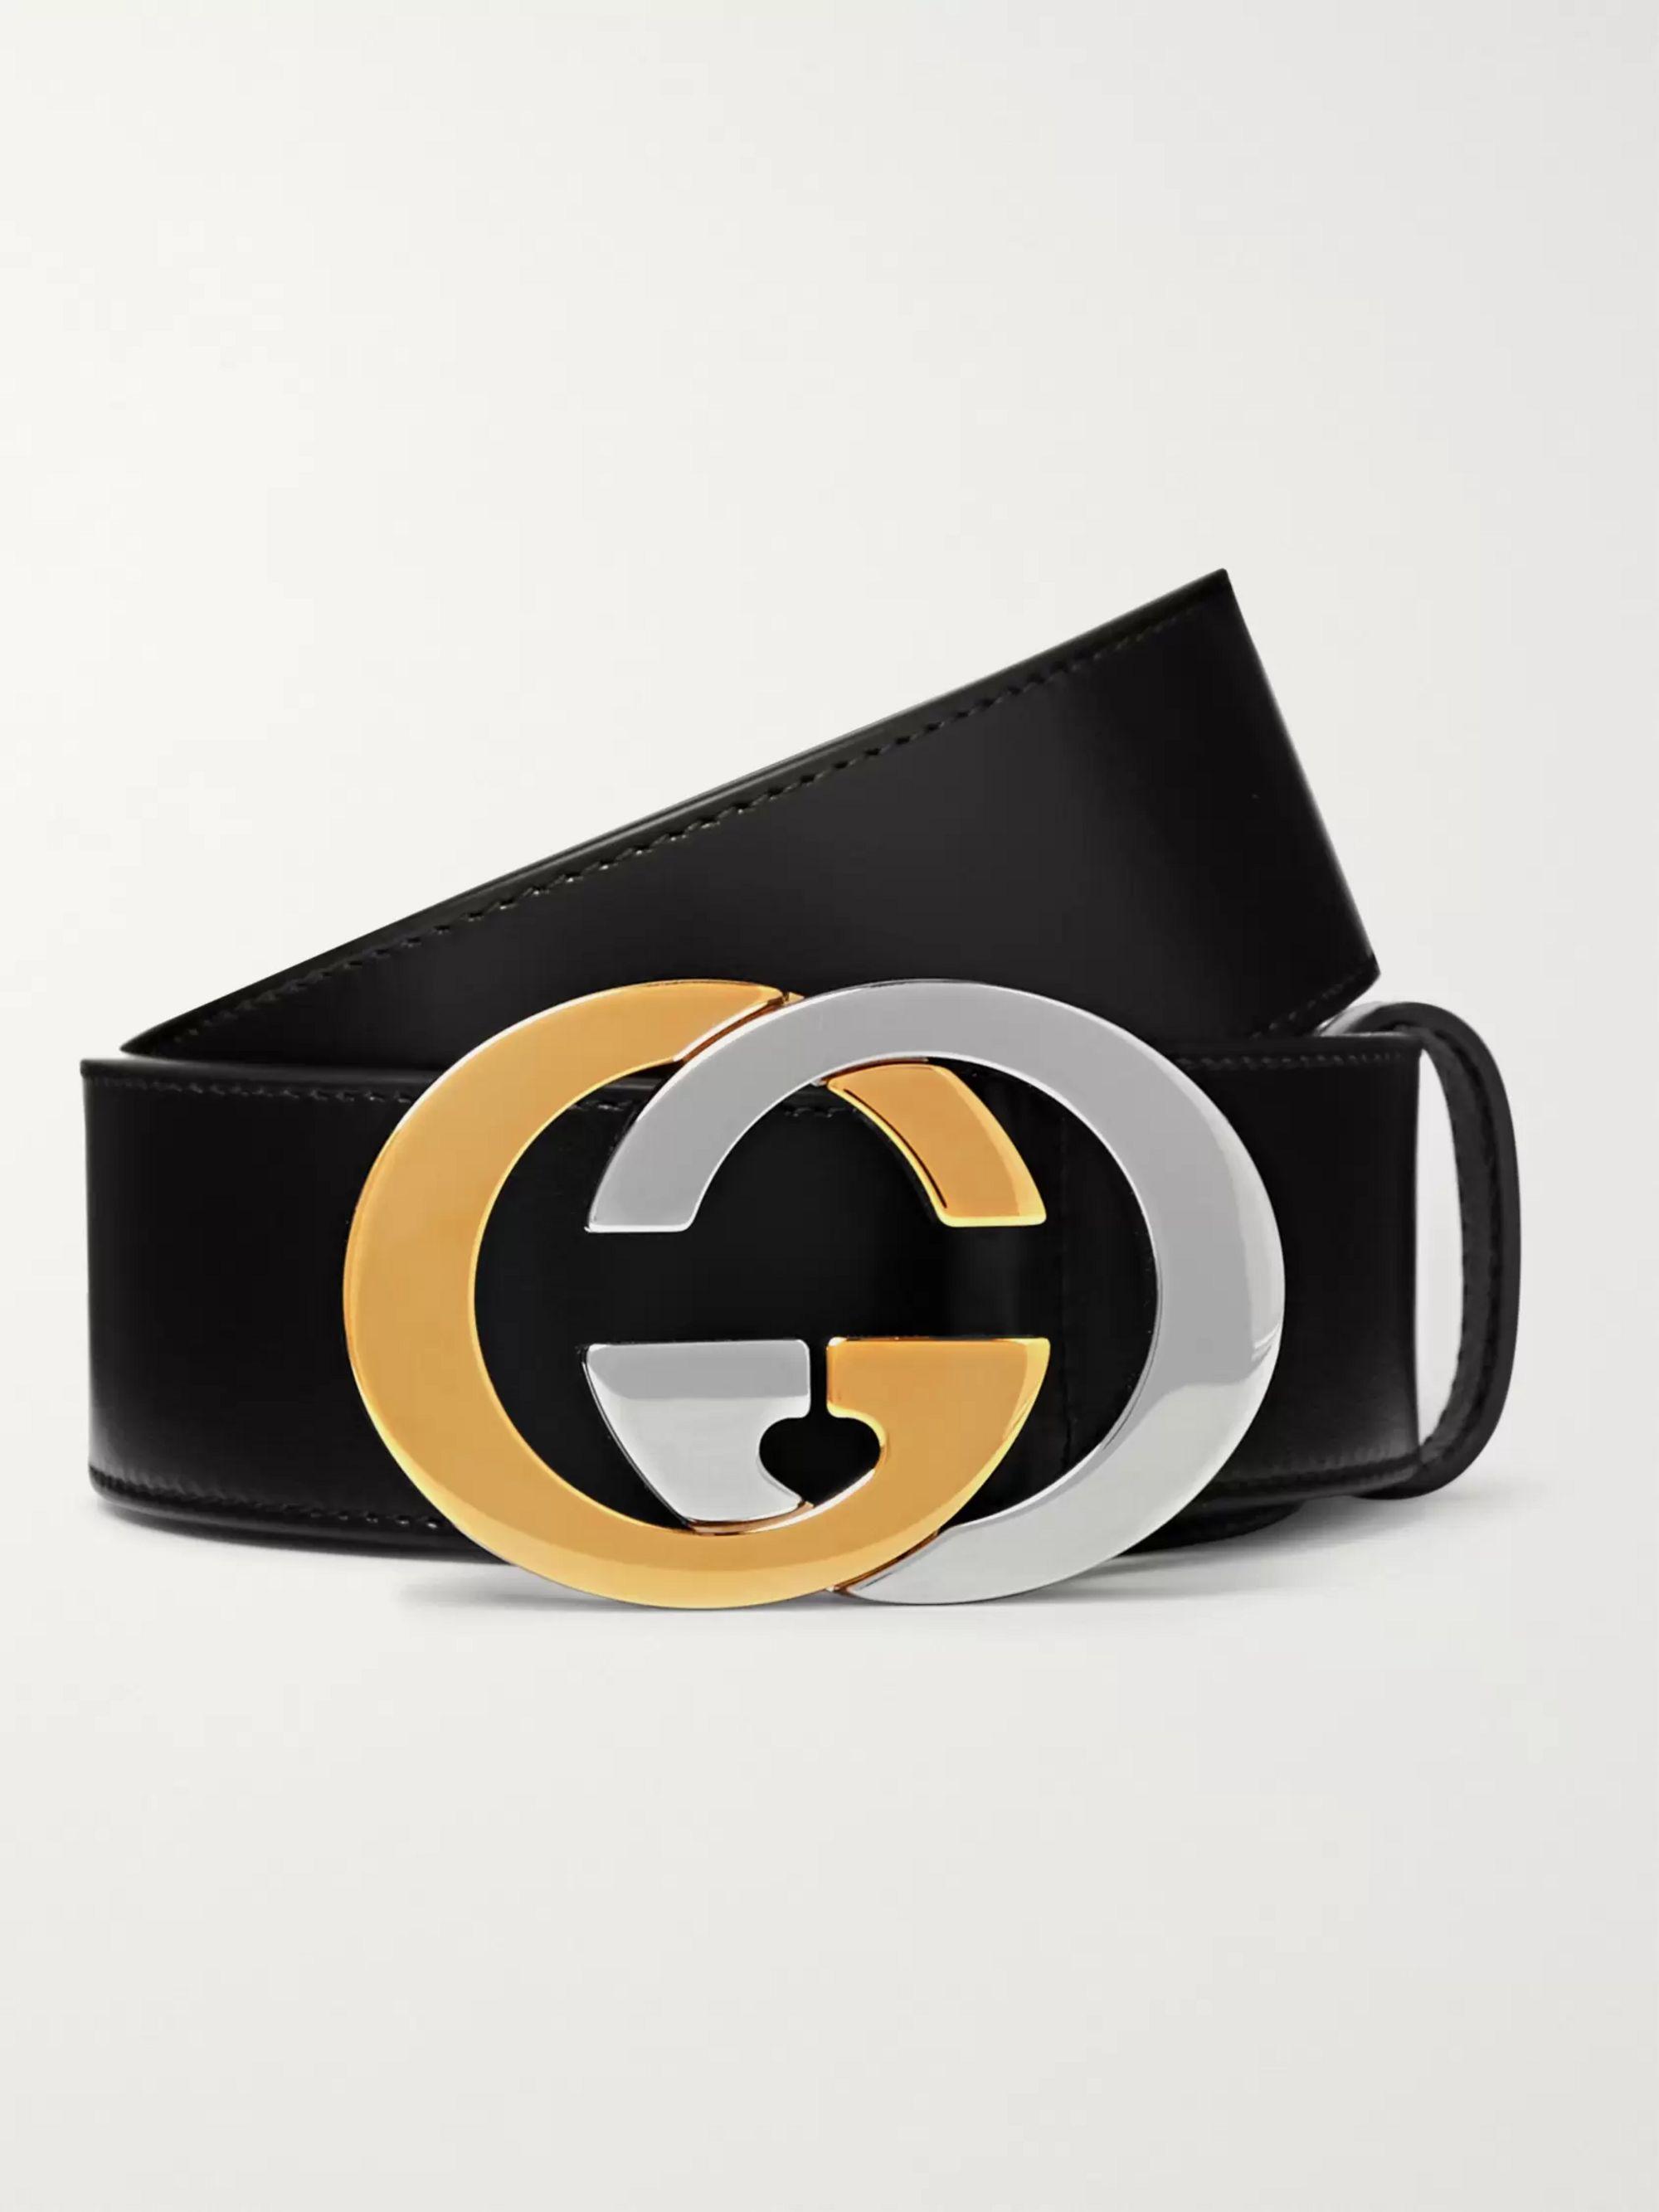 black and gold gucci belt